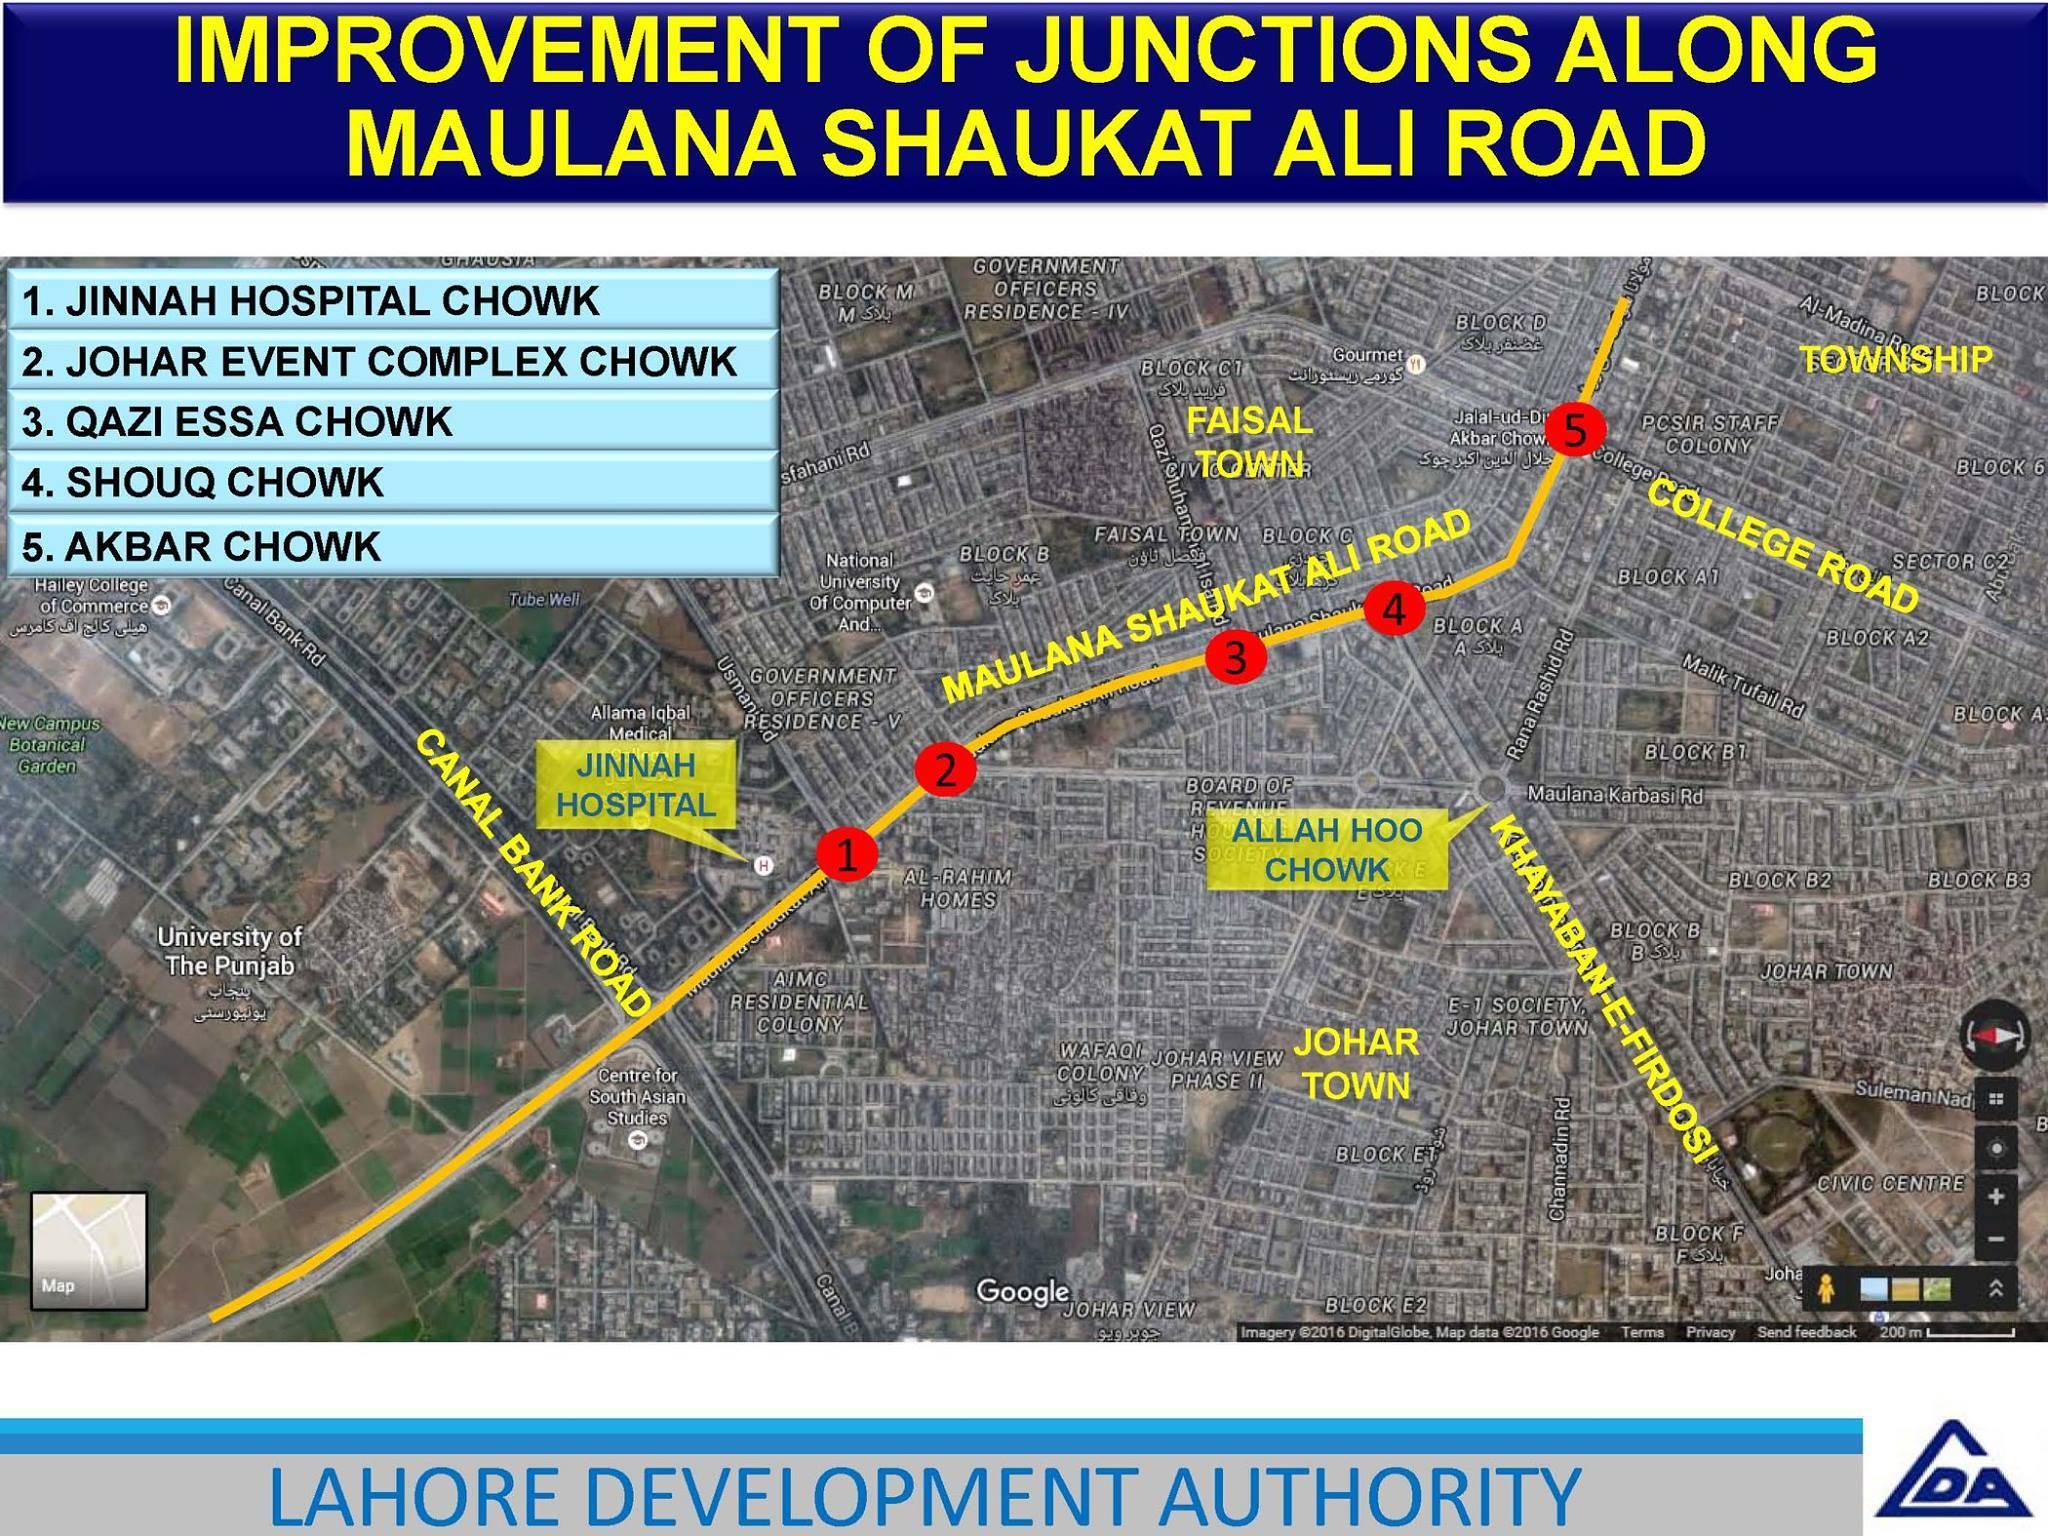 Improvement on Junction on Shoukat Ali Road